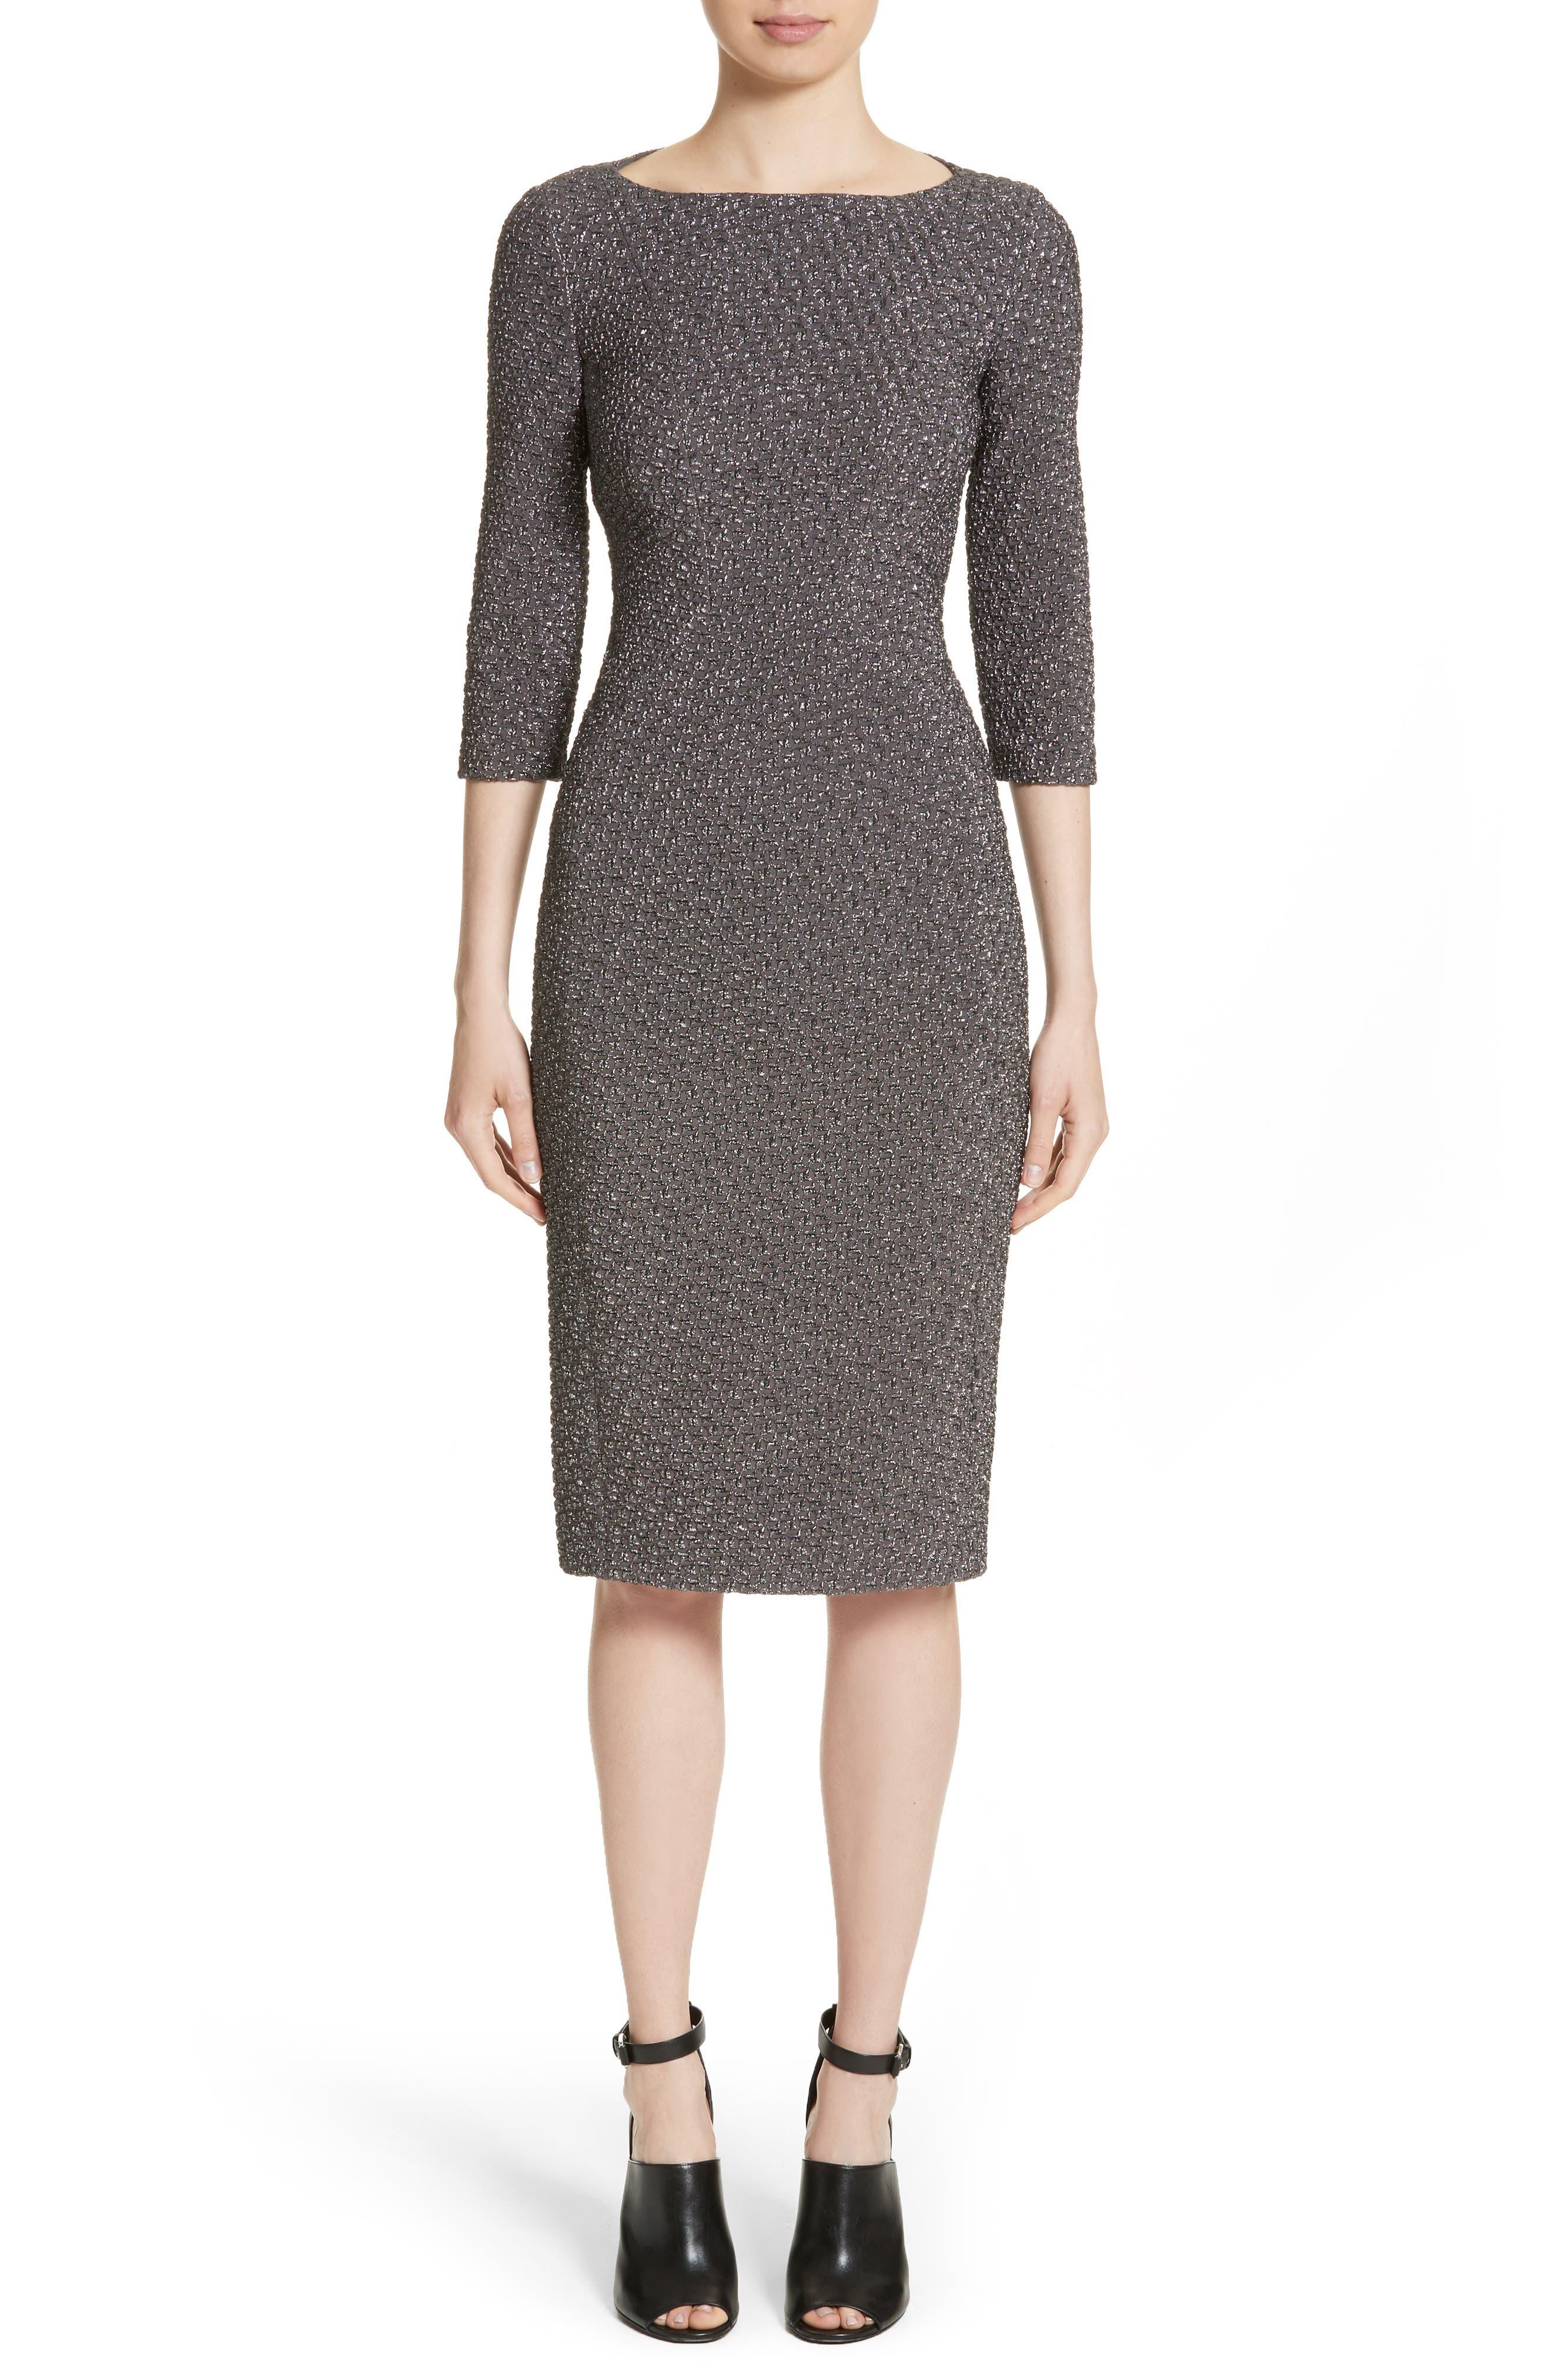 Houndstooth Stretch Metallic Jacquard Sheath Dress,                             Main thumbnail 1, color,                             029